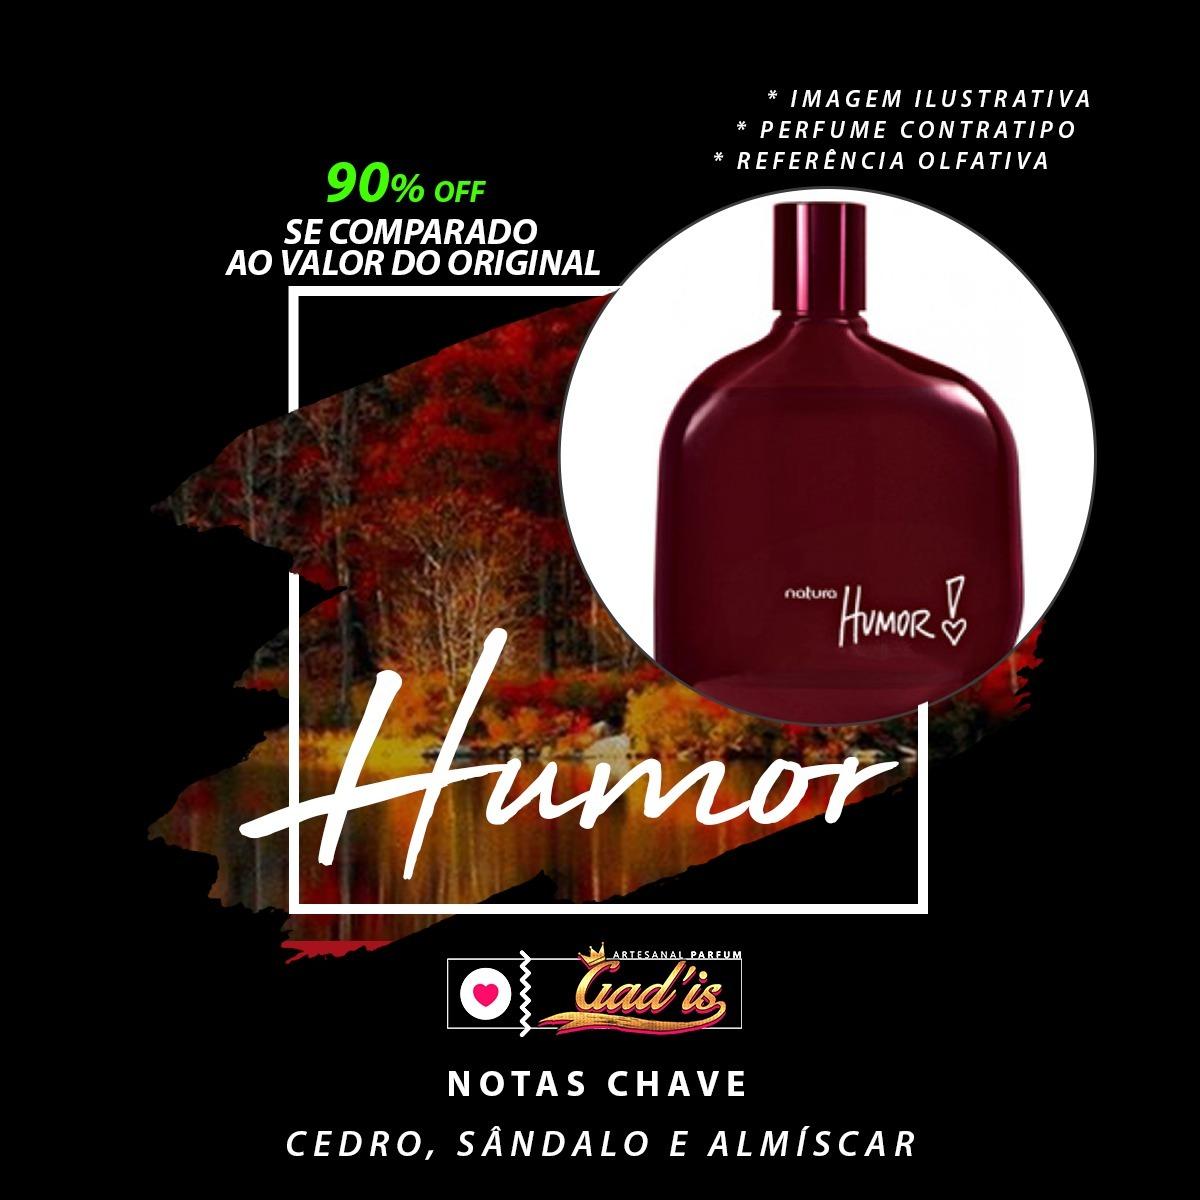 d56a614e584 Perfume Similar N 327 Inspirado Em Humor 2 Masculino 120ml - R  79 ...